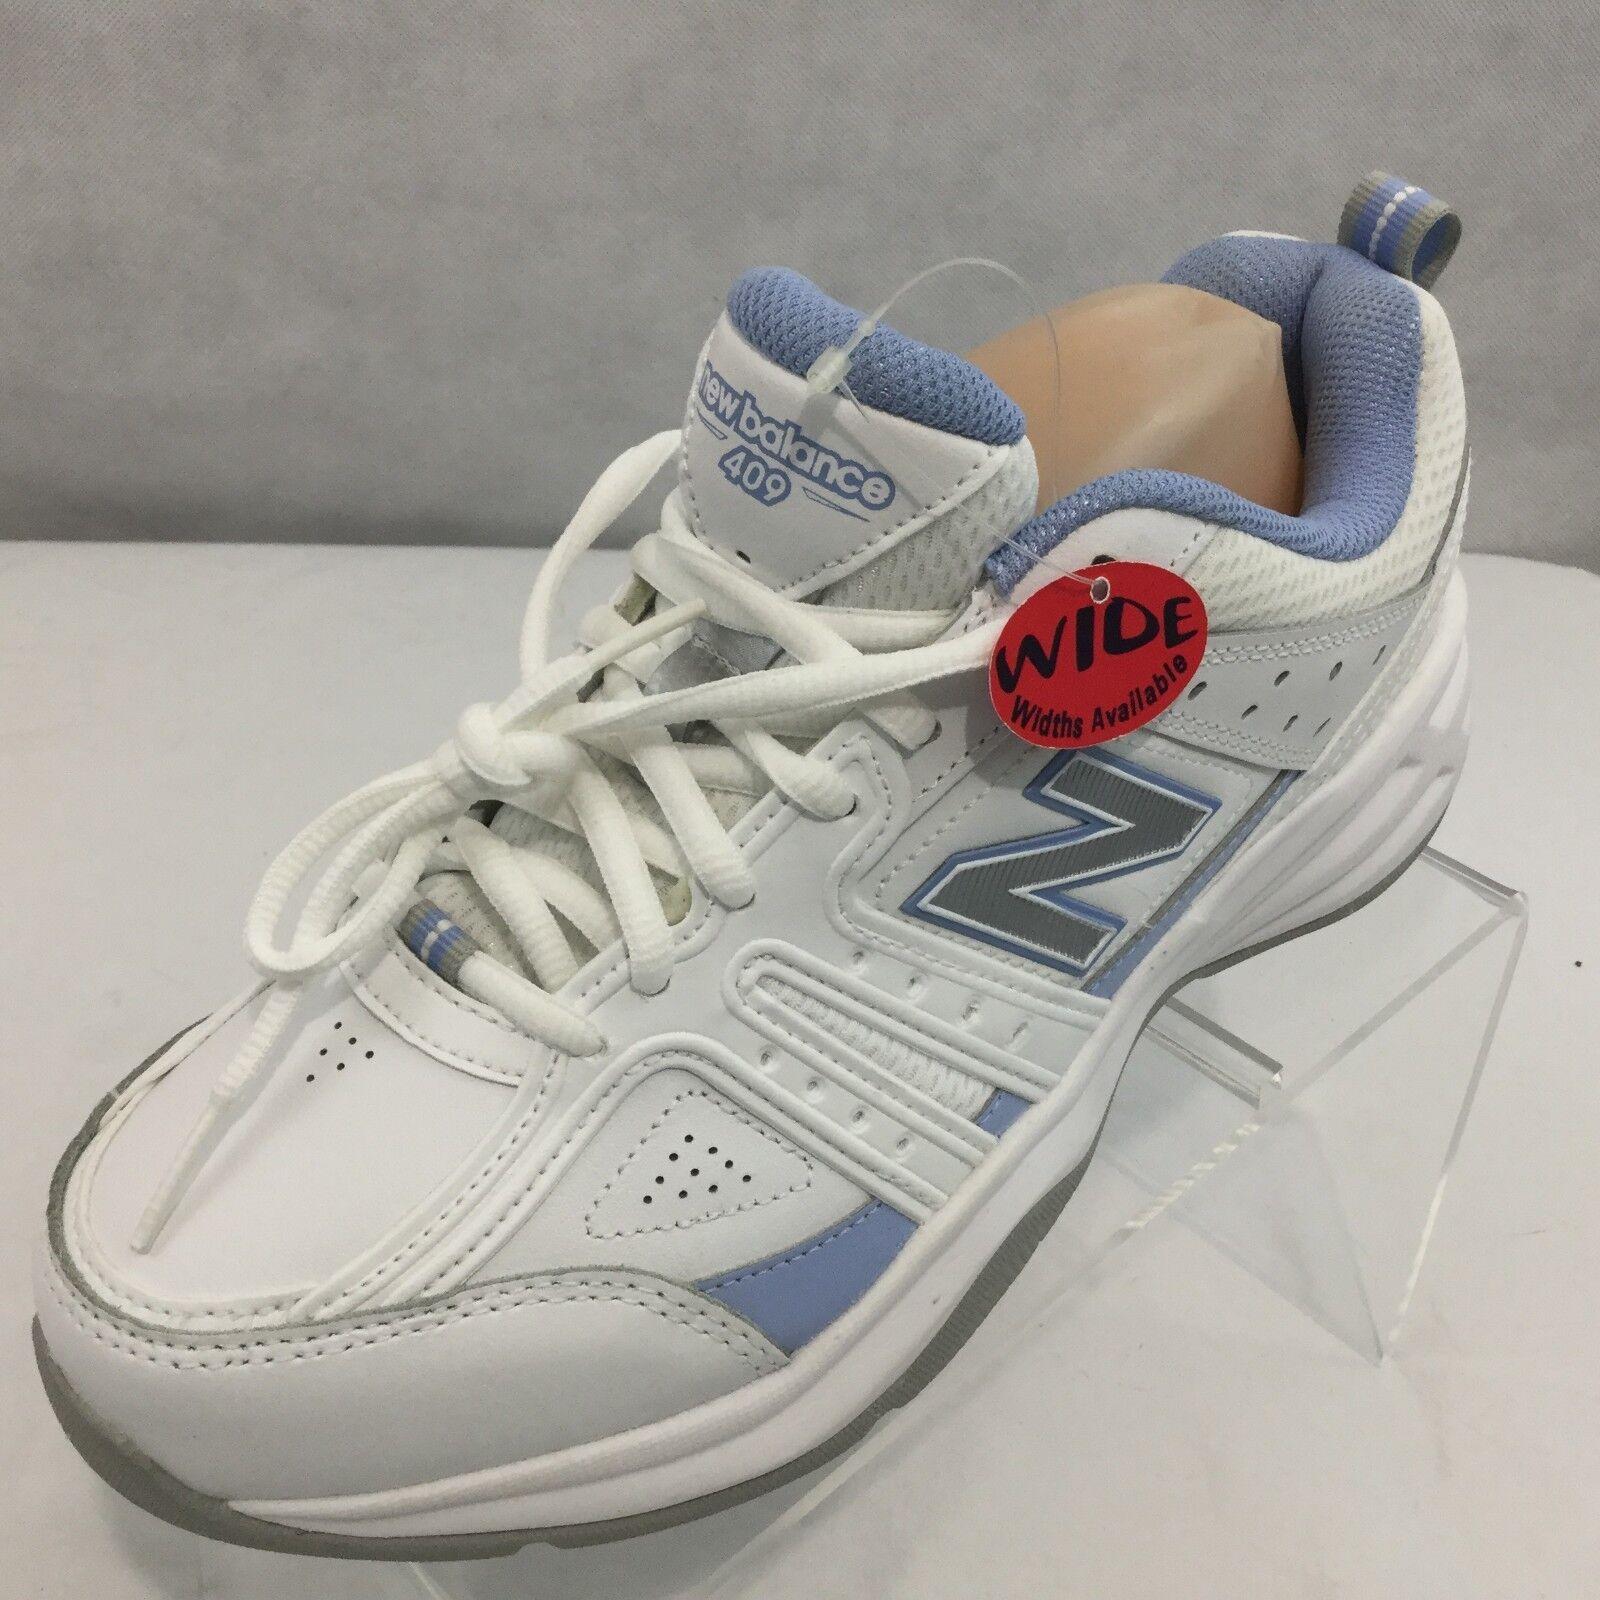 New Balance 409 scarpe da ginnastica ginnastica ginnastica Sz 9 Wild bianca blu Walking Training Lightweight NWT e76d23